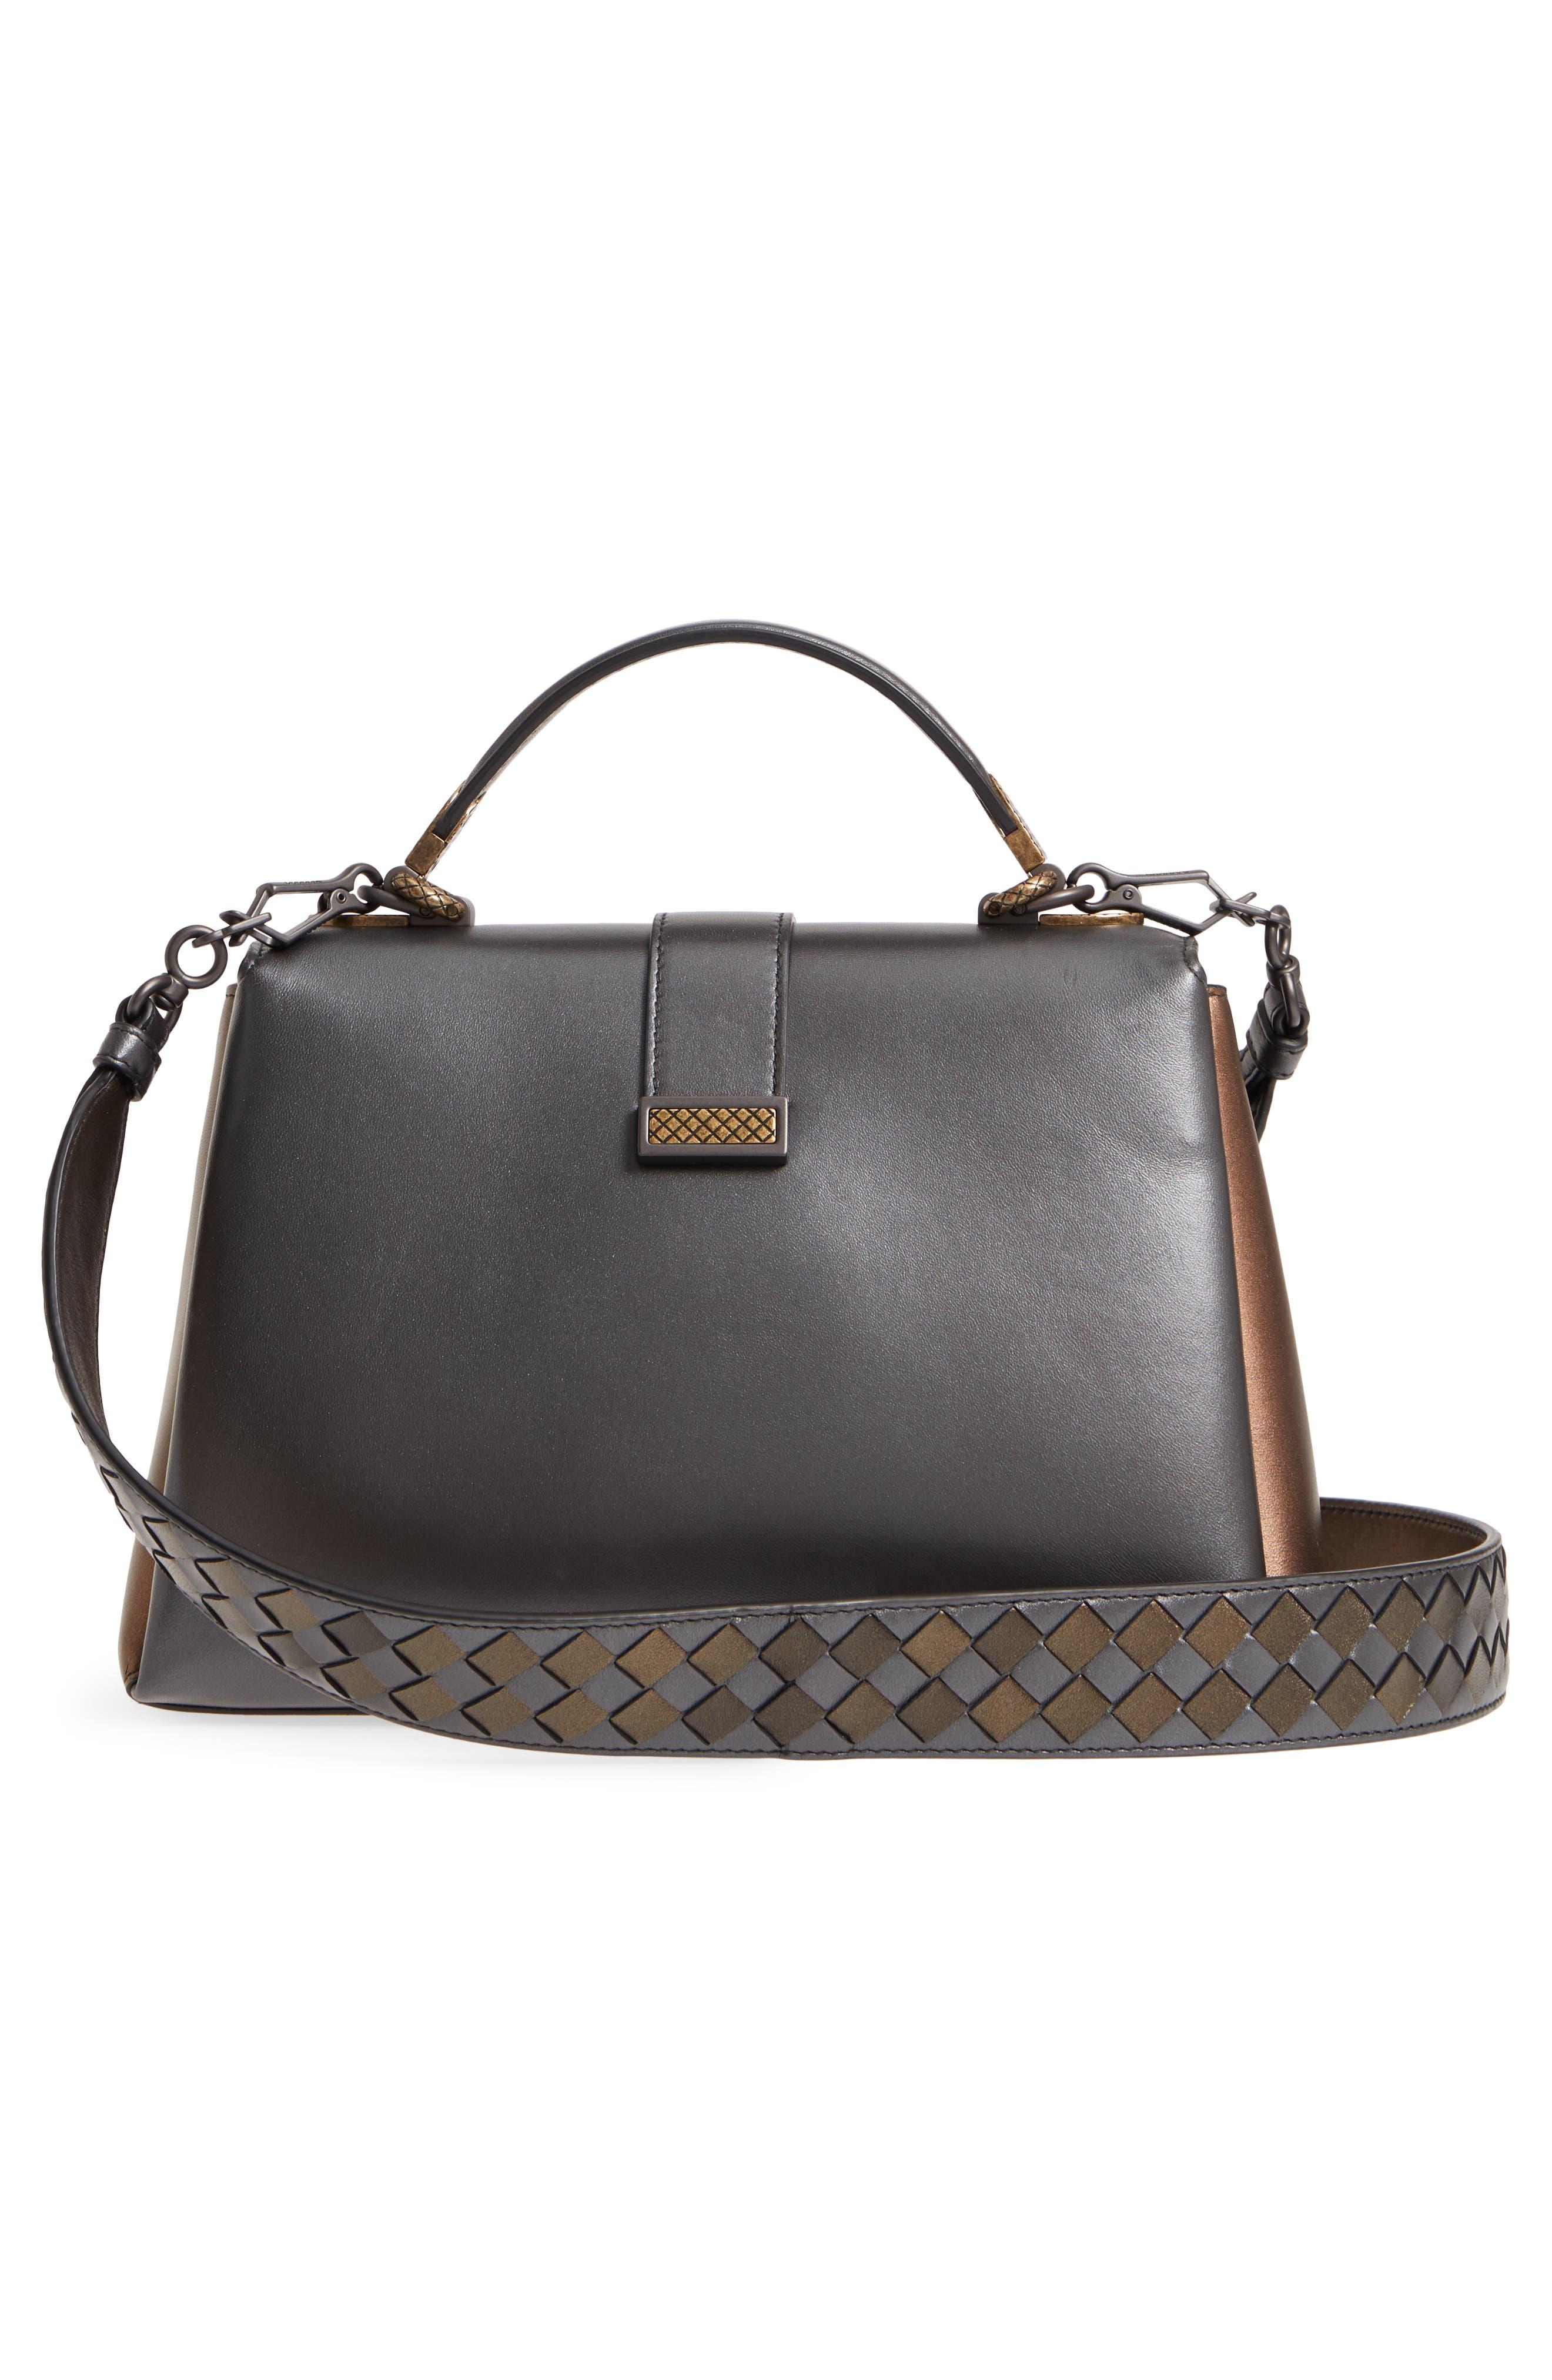 Small Piazza Tricolor Metallic Leather Handbag,                             Alternate thumbnail 3, color,                             DARK GOLD MULTI